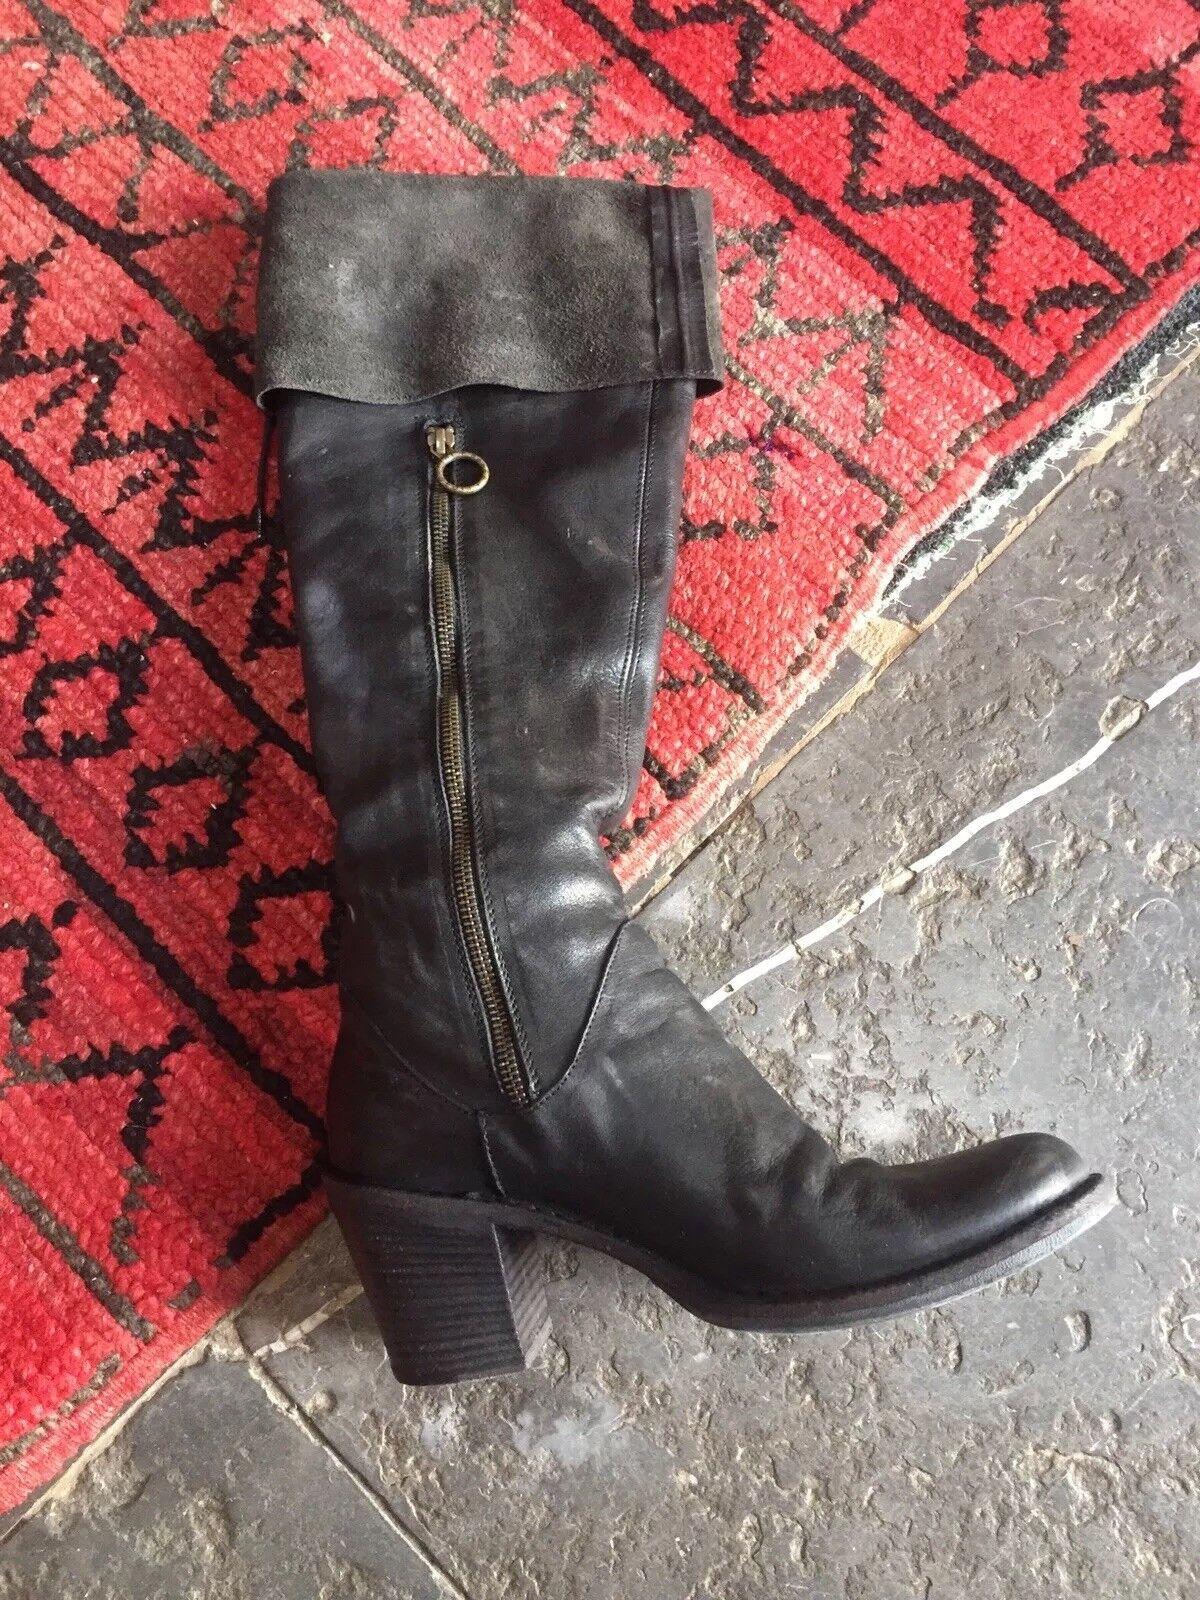 Stylish Black Fiorentini Baker boots